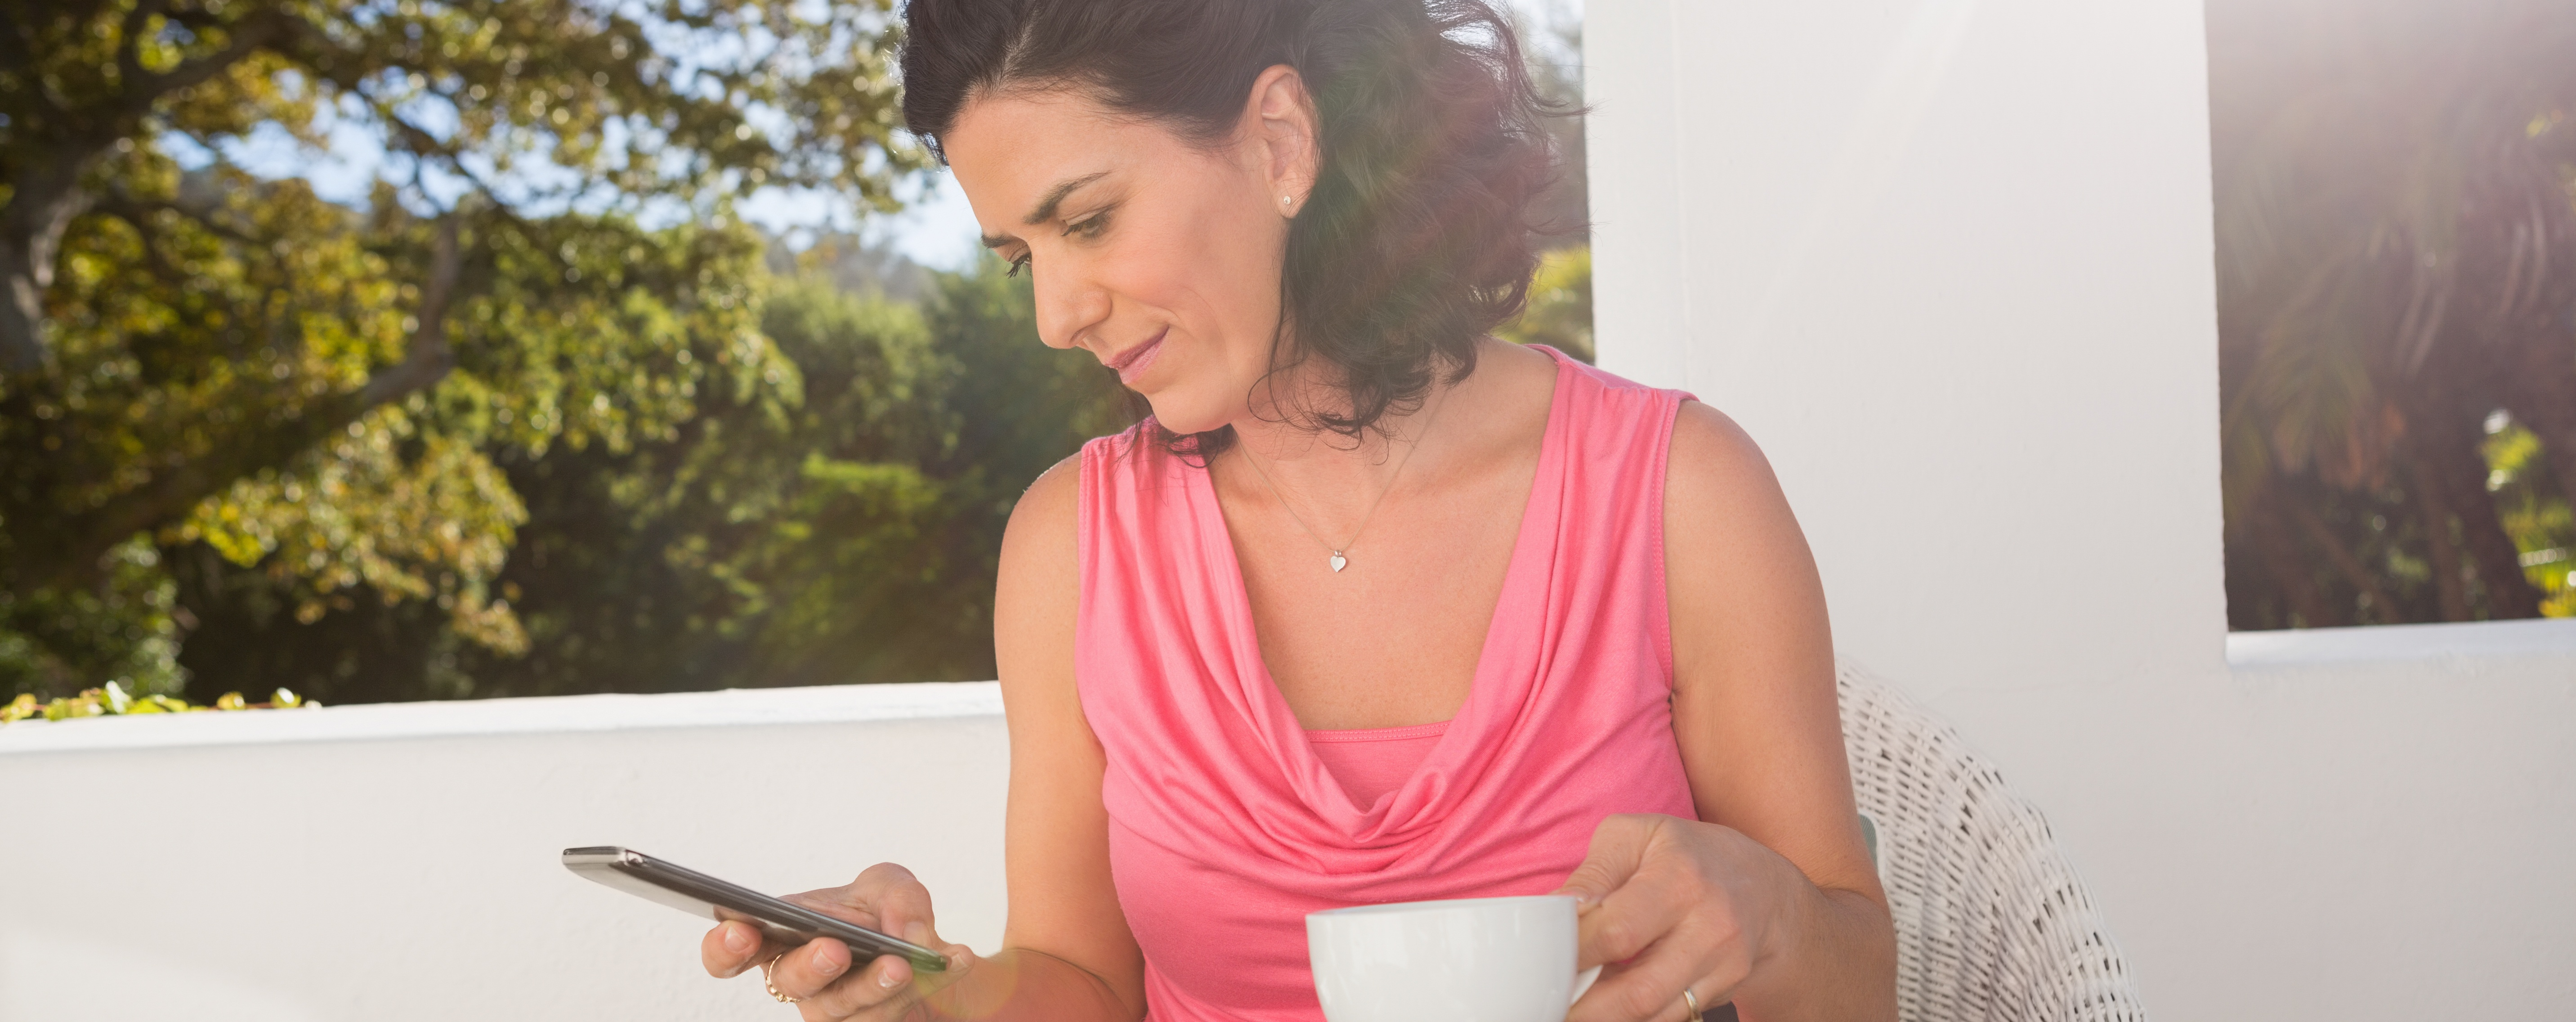 woman on balcony coffee phone cropped-1